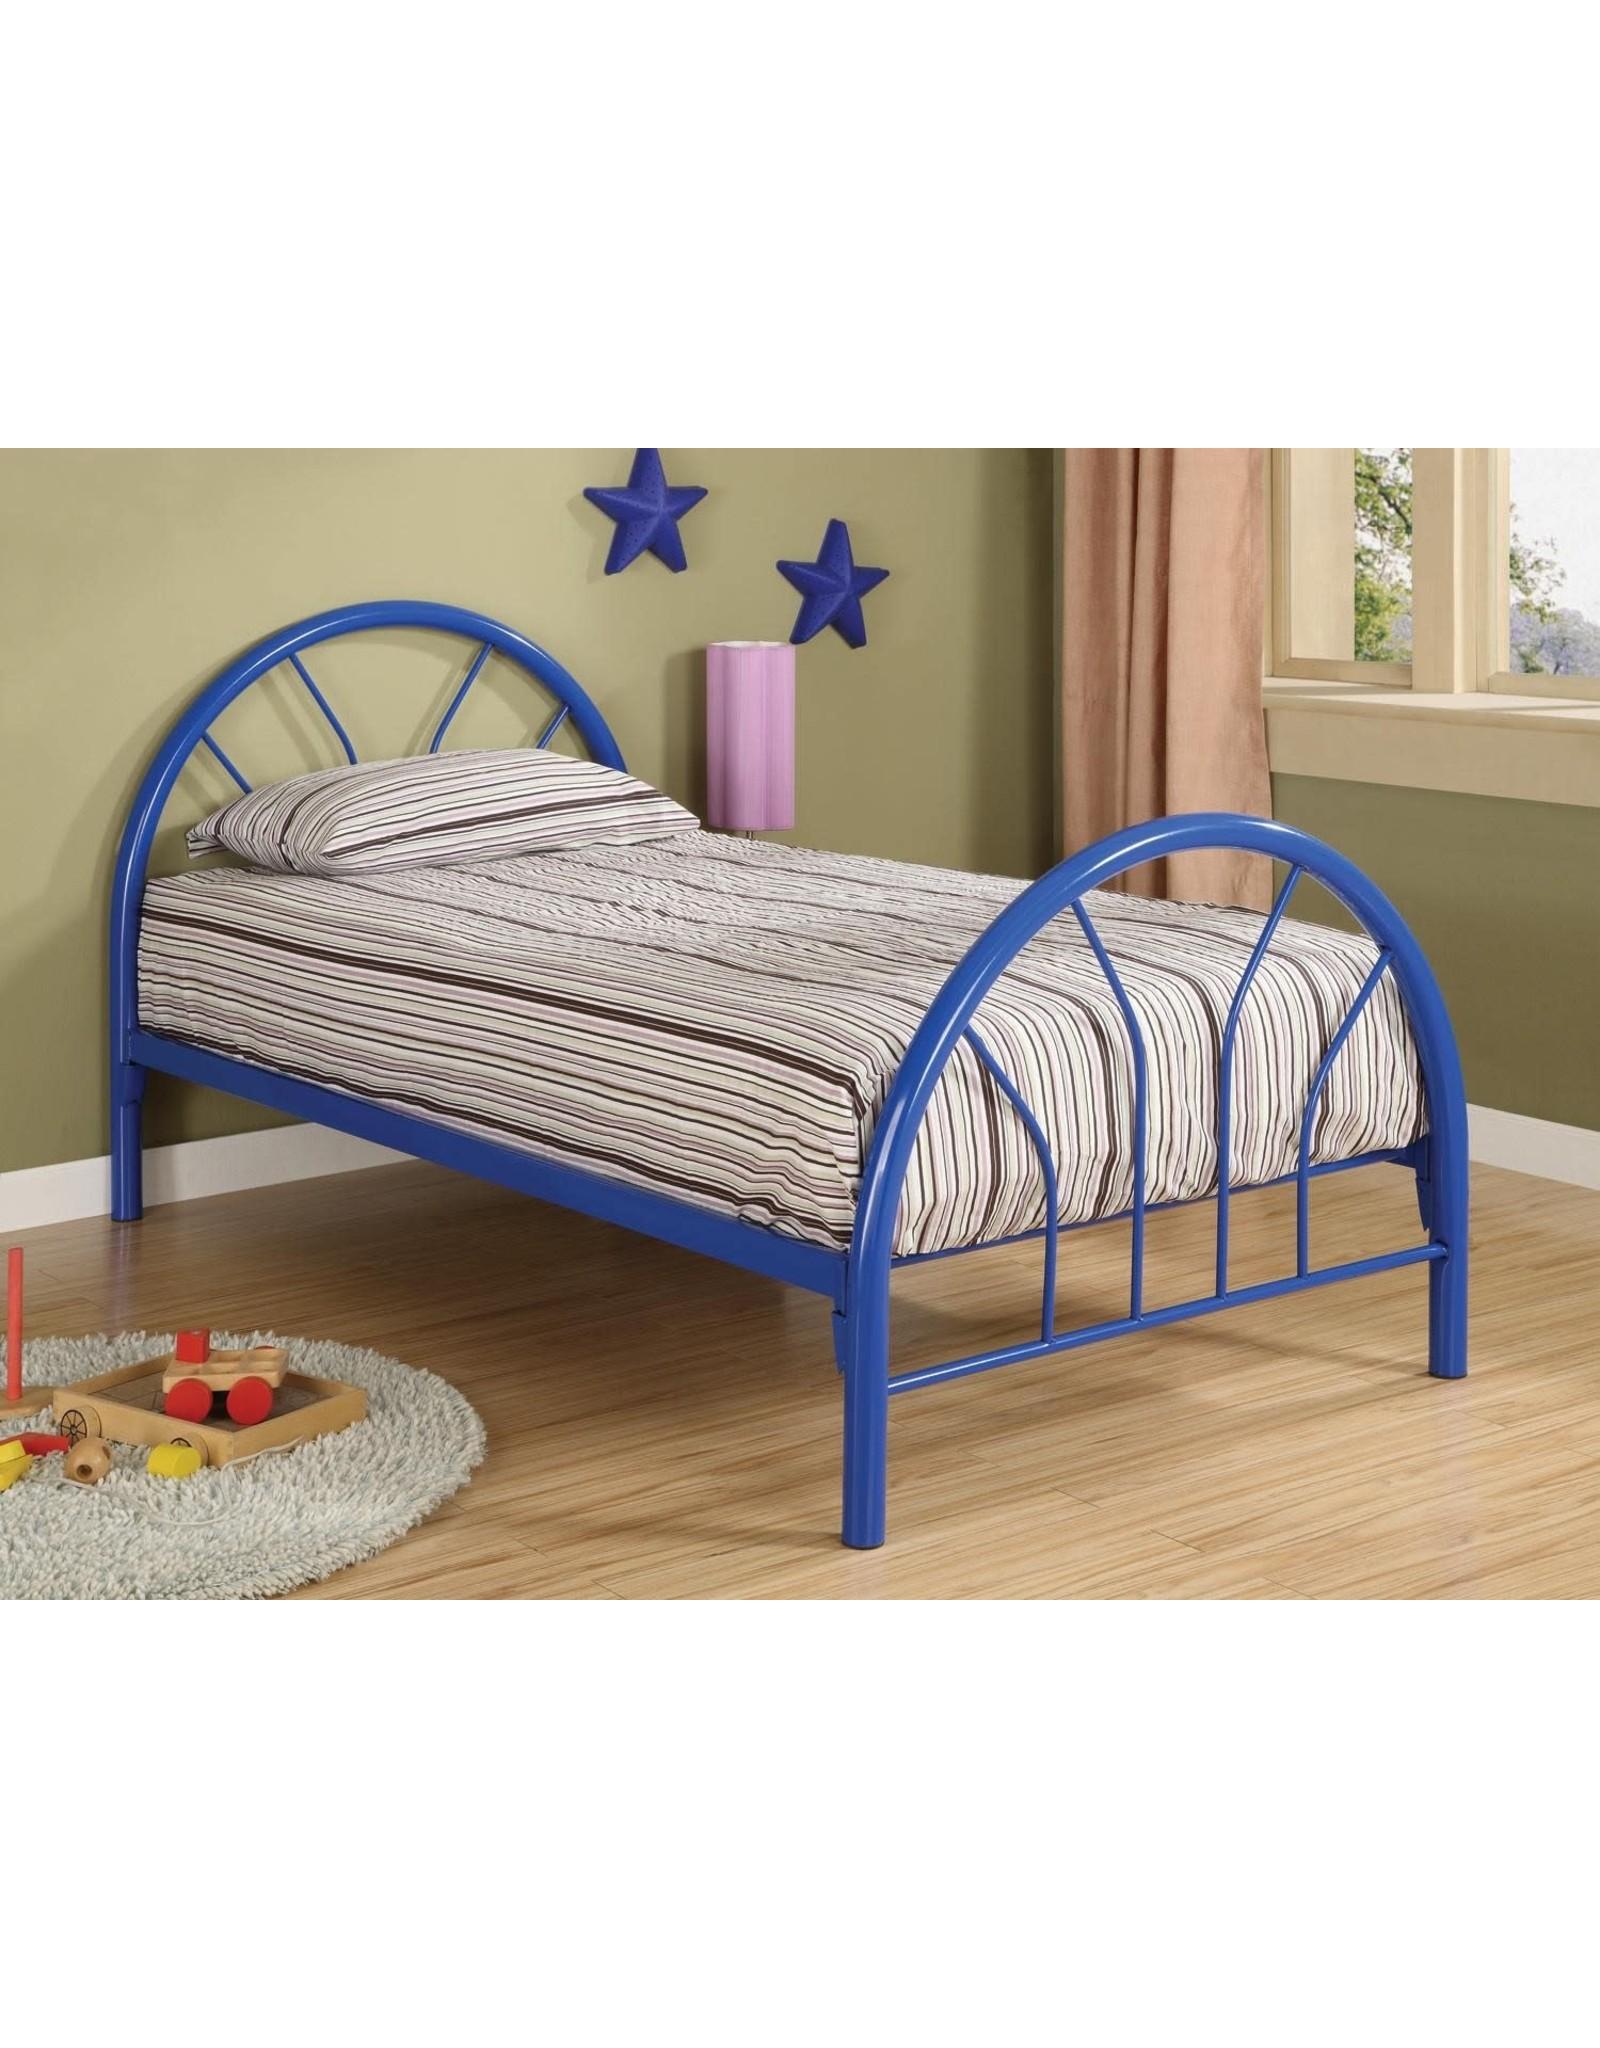 GR-215 Blue Twin Bed